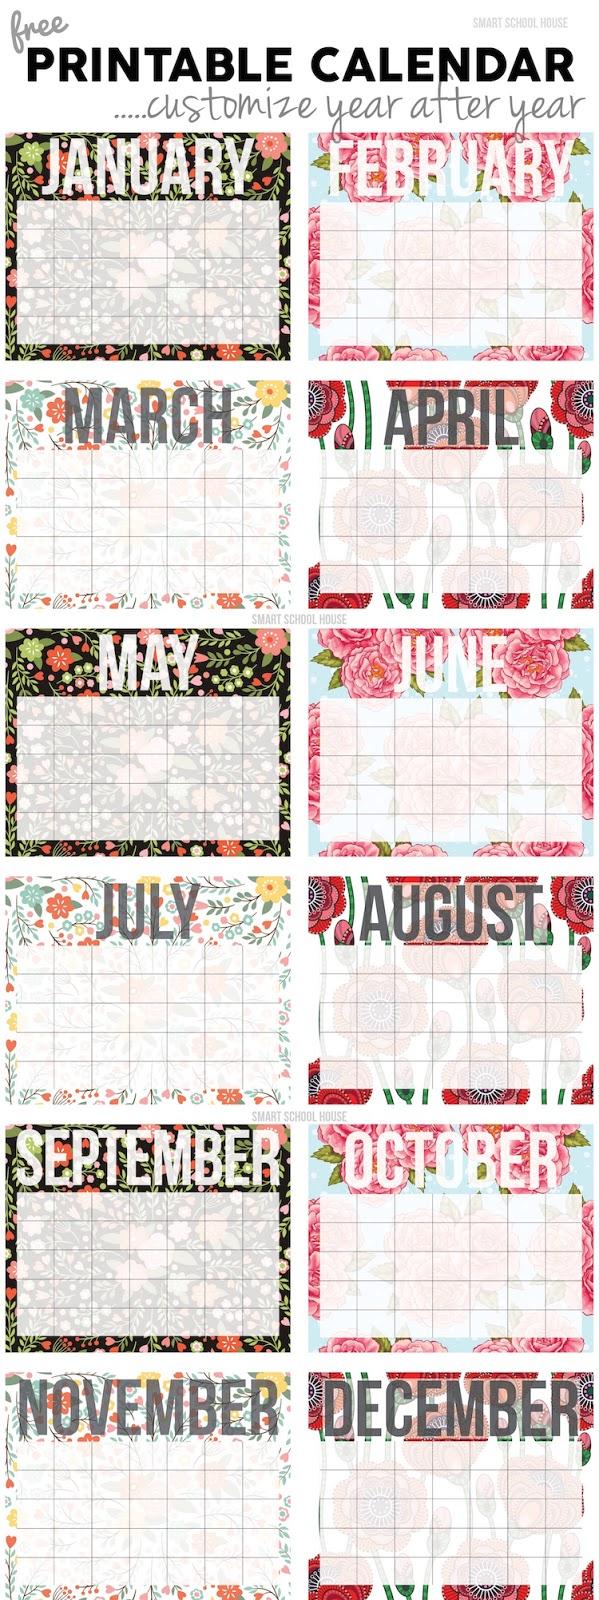 http://www.smartschoolhouse.com/diy-crafts/free-calendar#_a5y_p=3136600